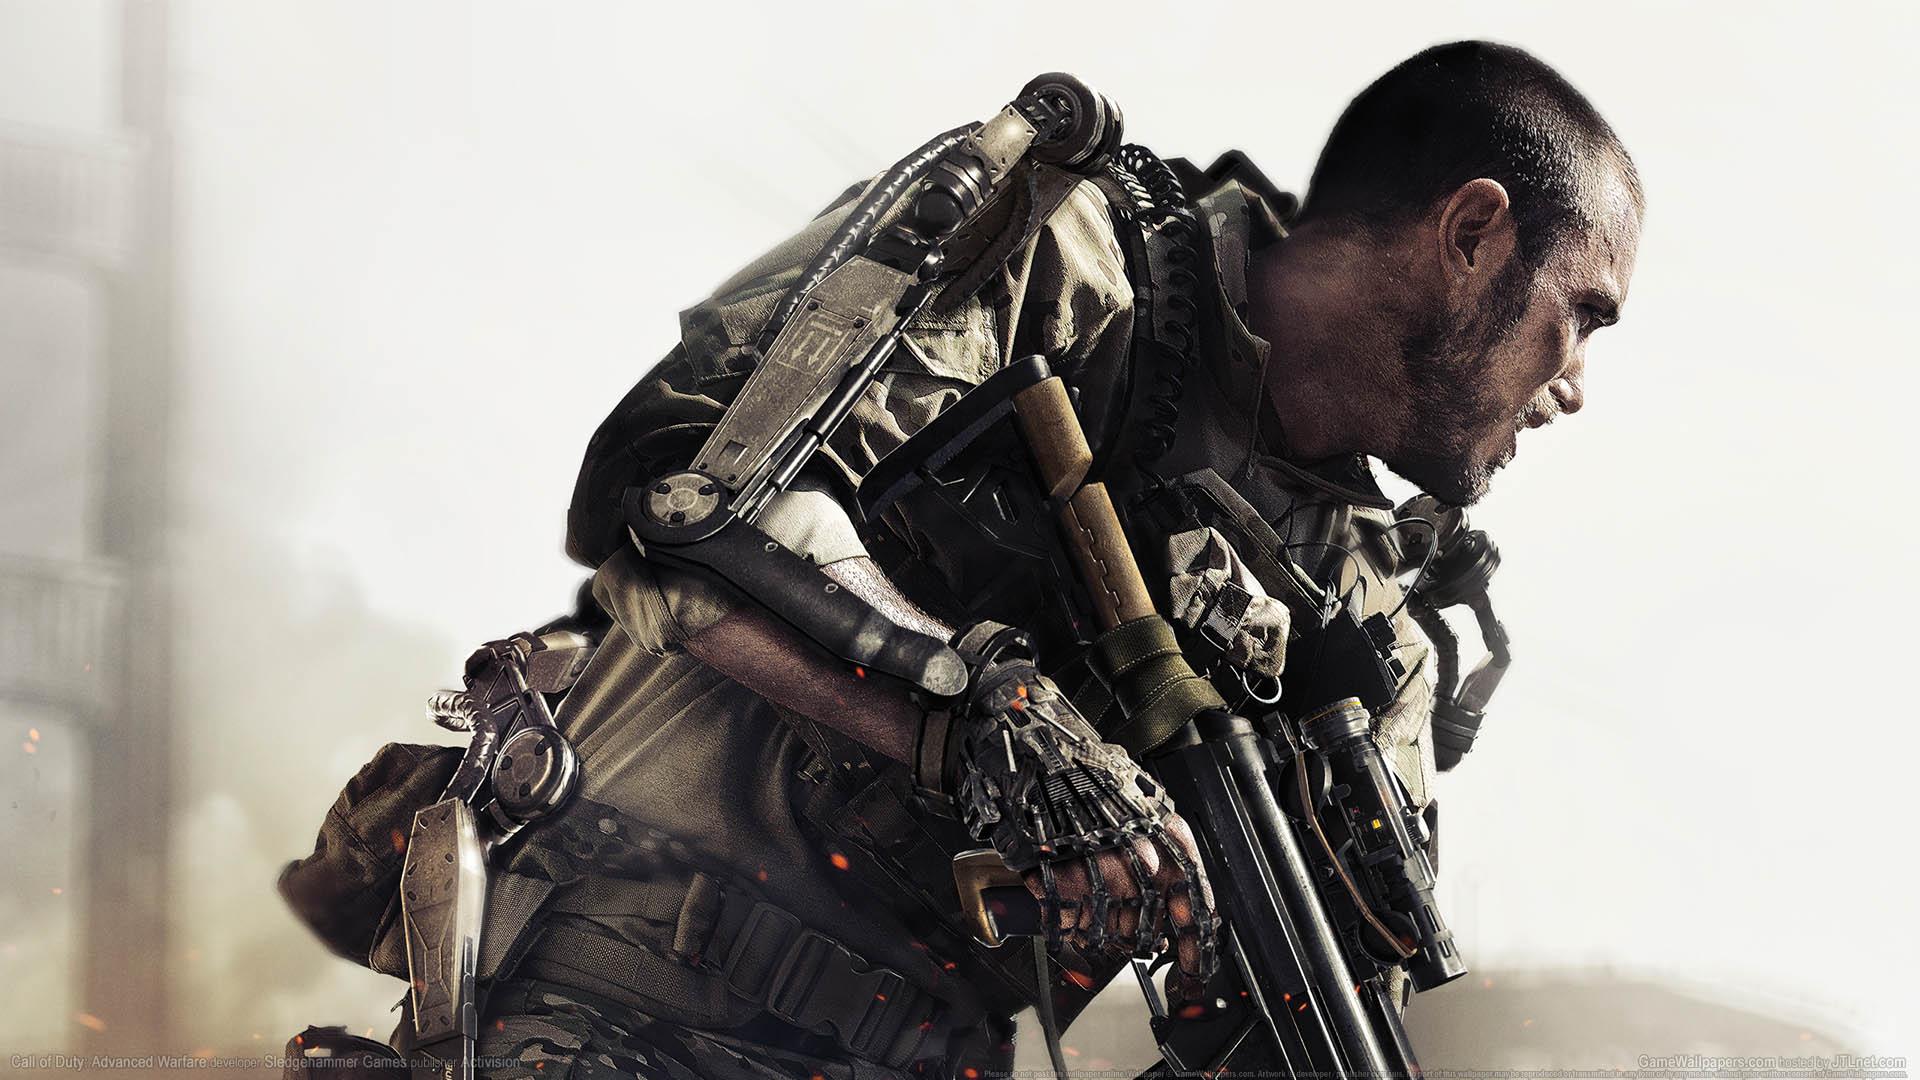 Call of Duty: Advanced Warfare wallpaper 01 1920x1080